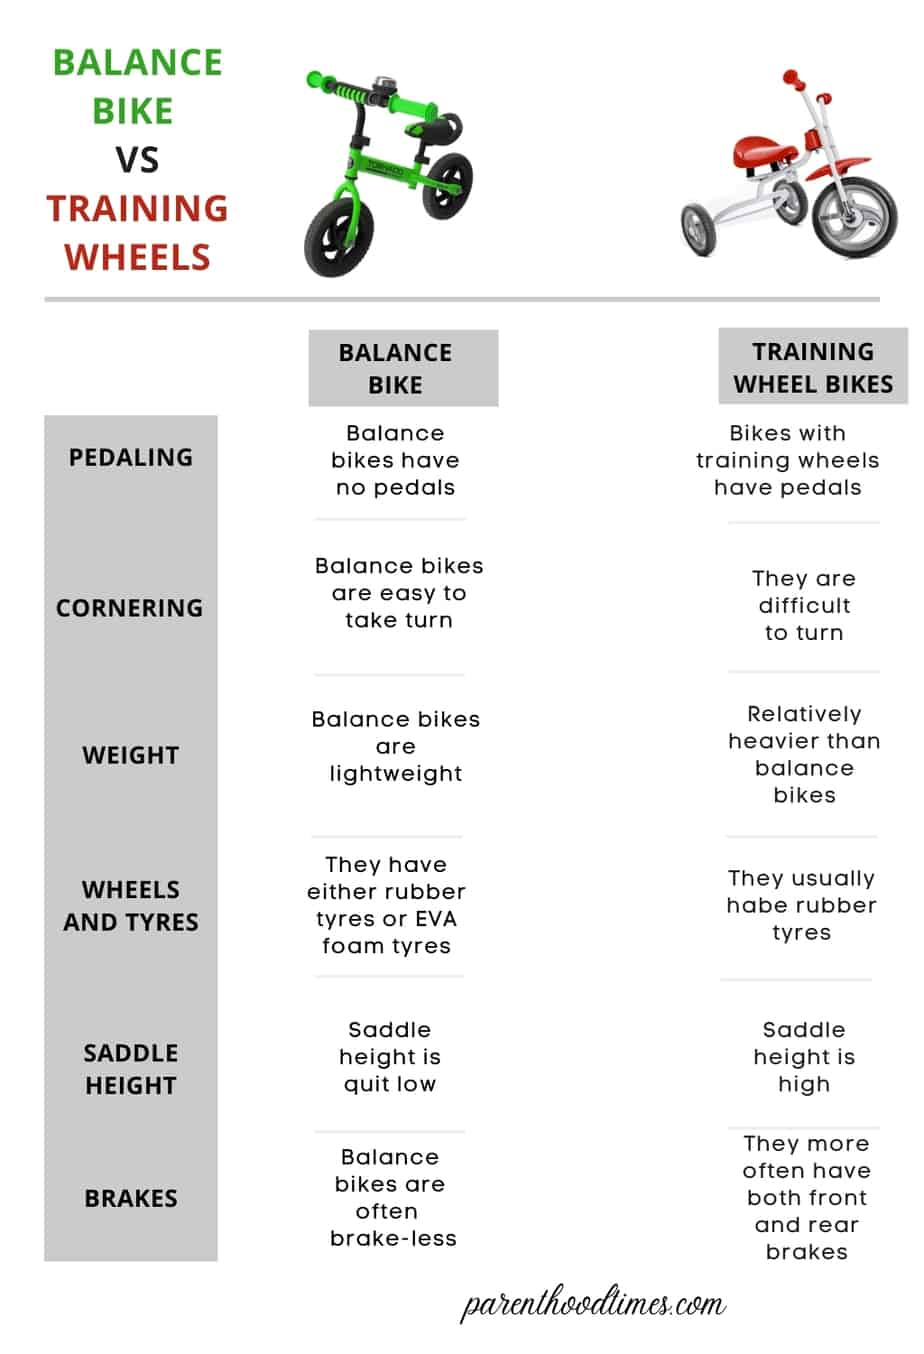 Balance Bike Vs. Training Wheels